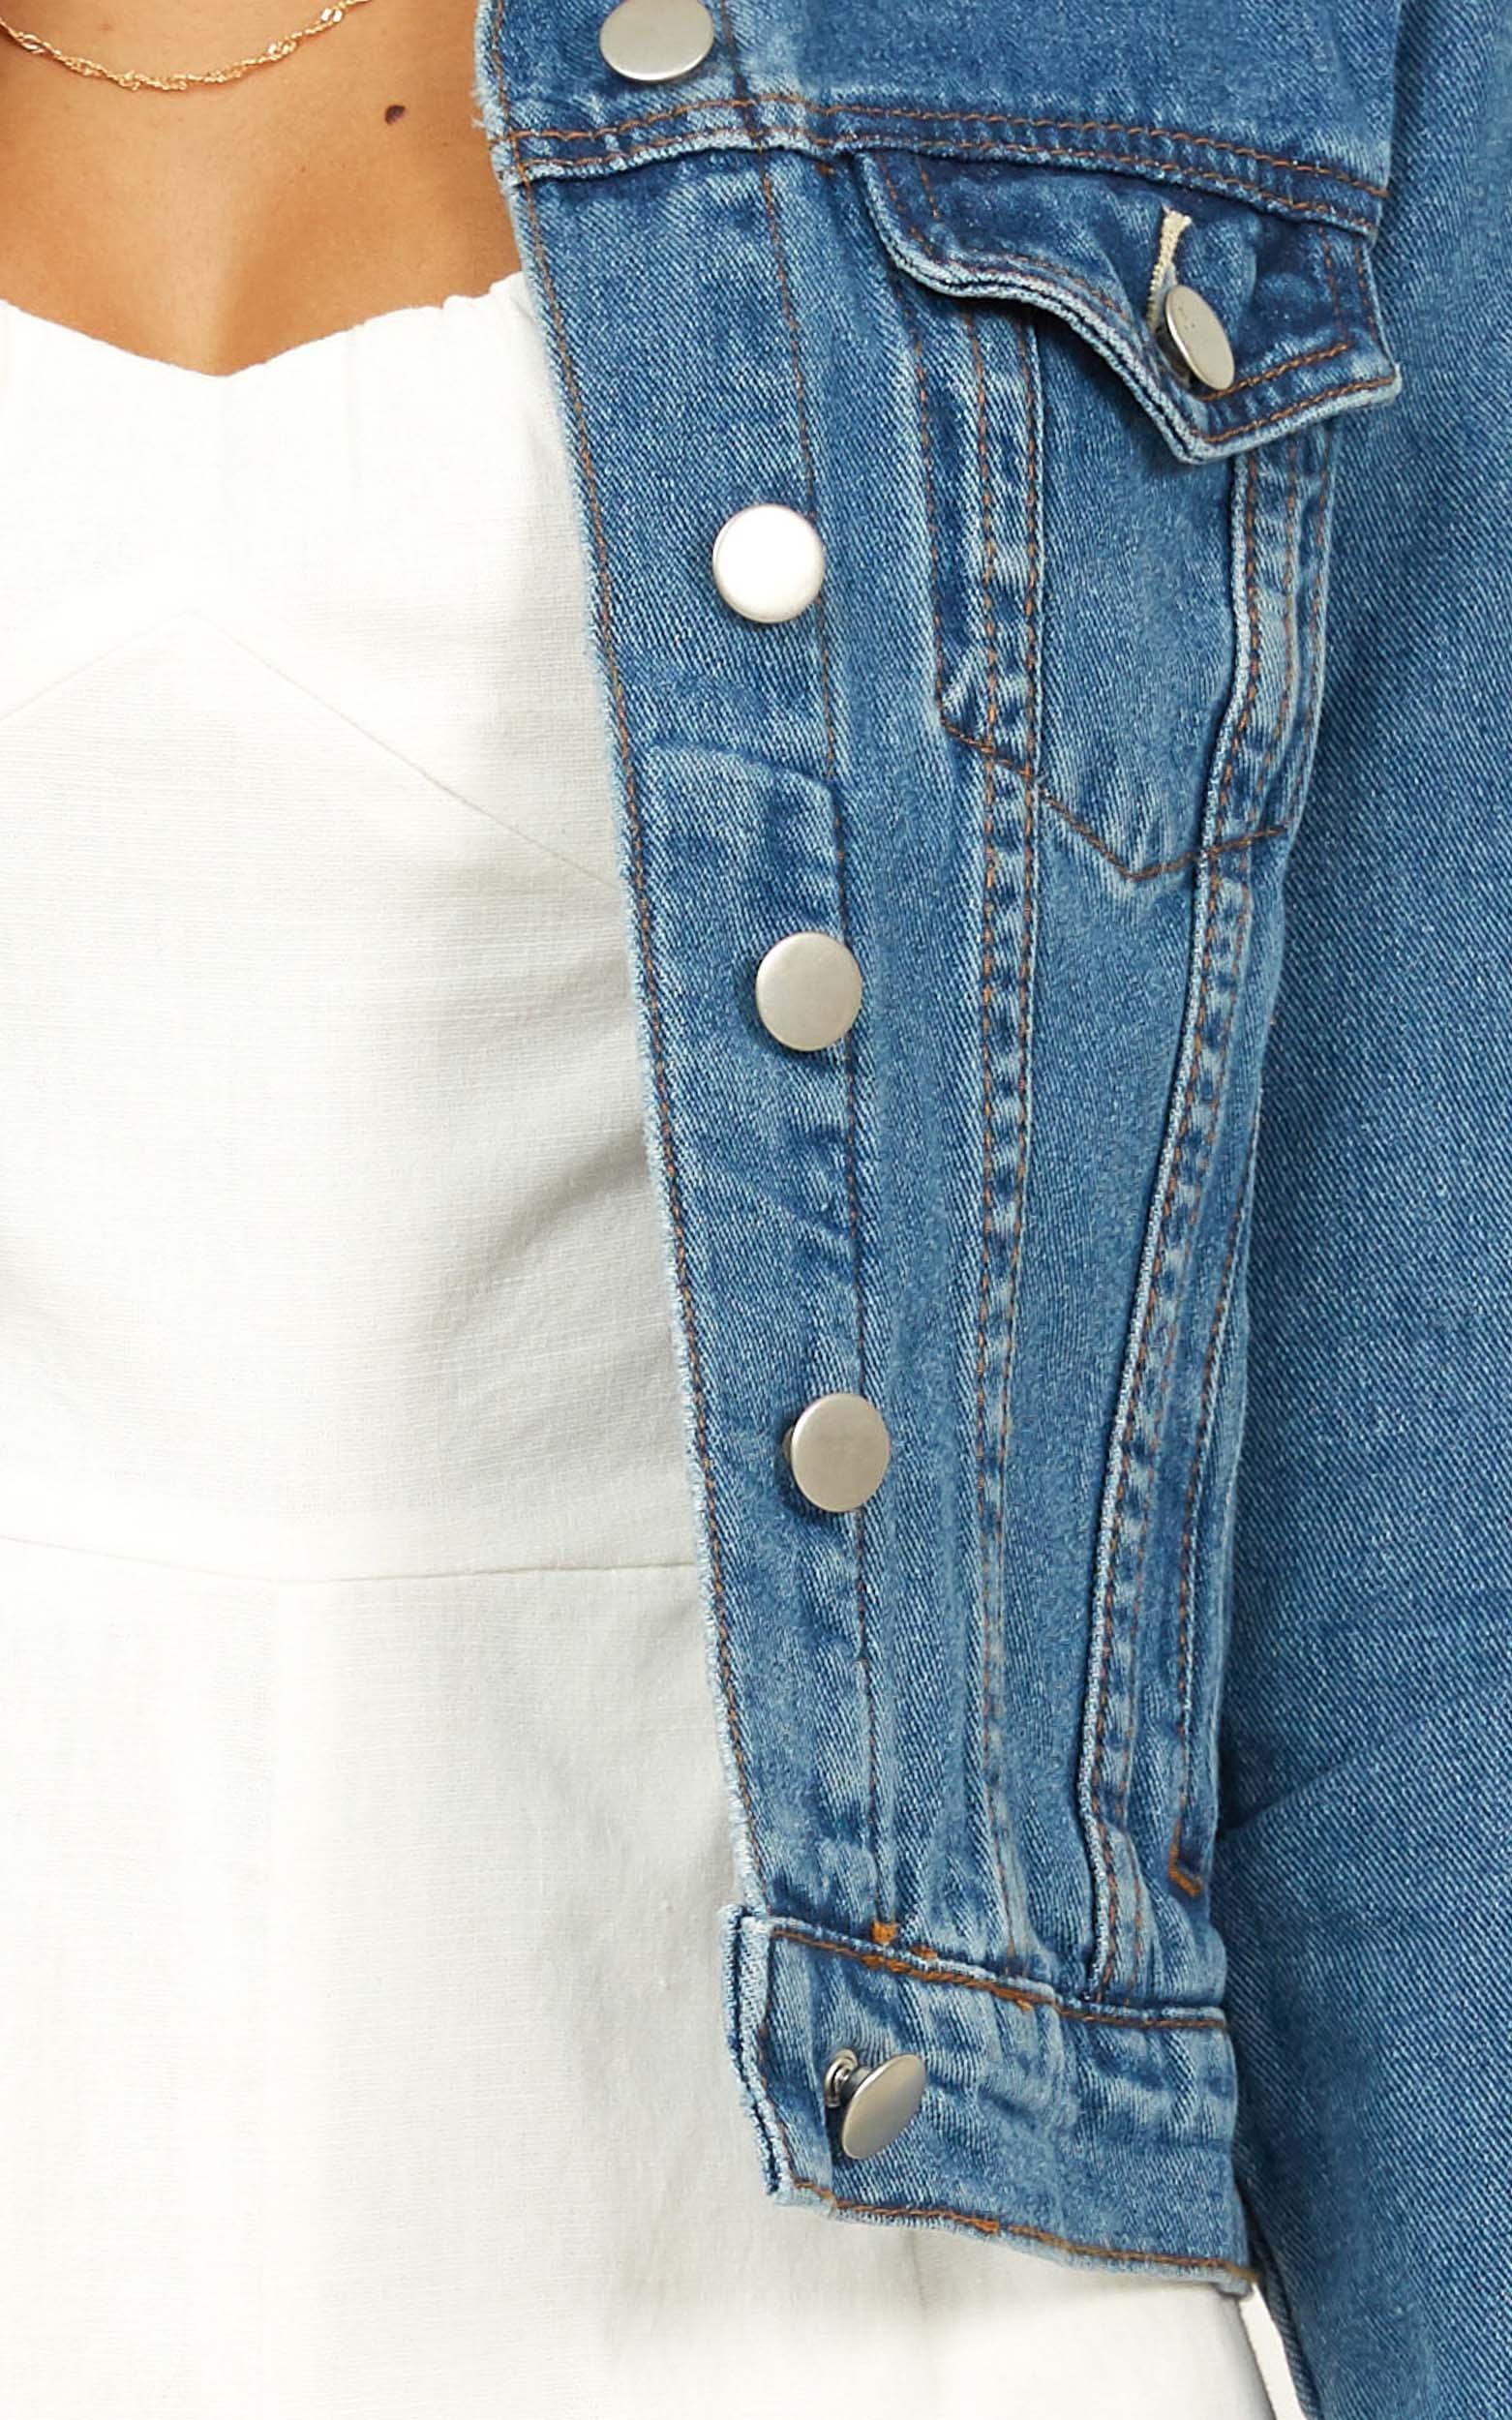 Summer Loving Denim Jacket In mid wash - 20 (XXXXL), Blue, hi-res image number null